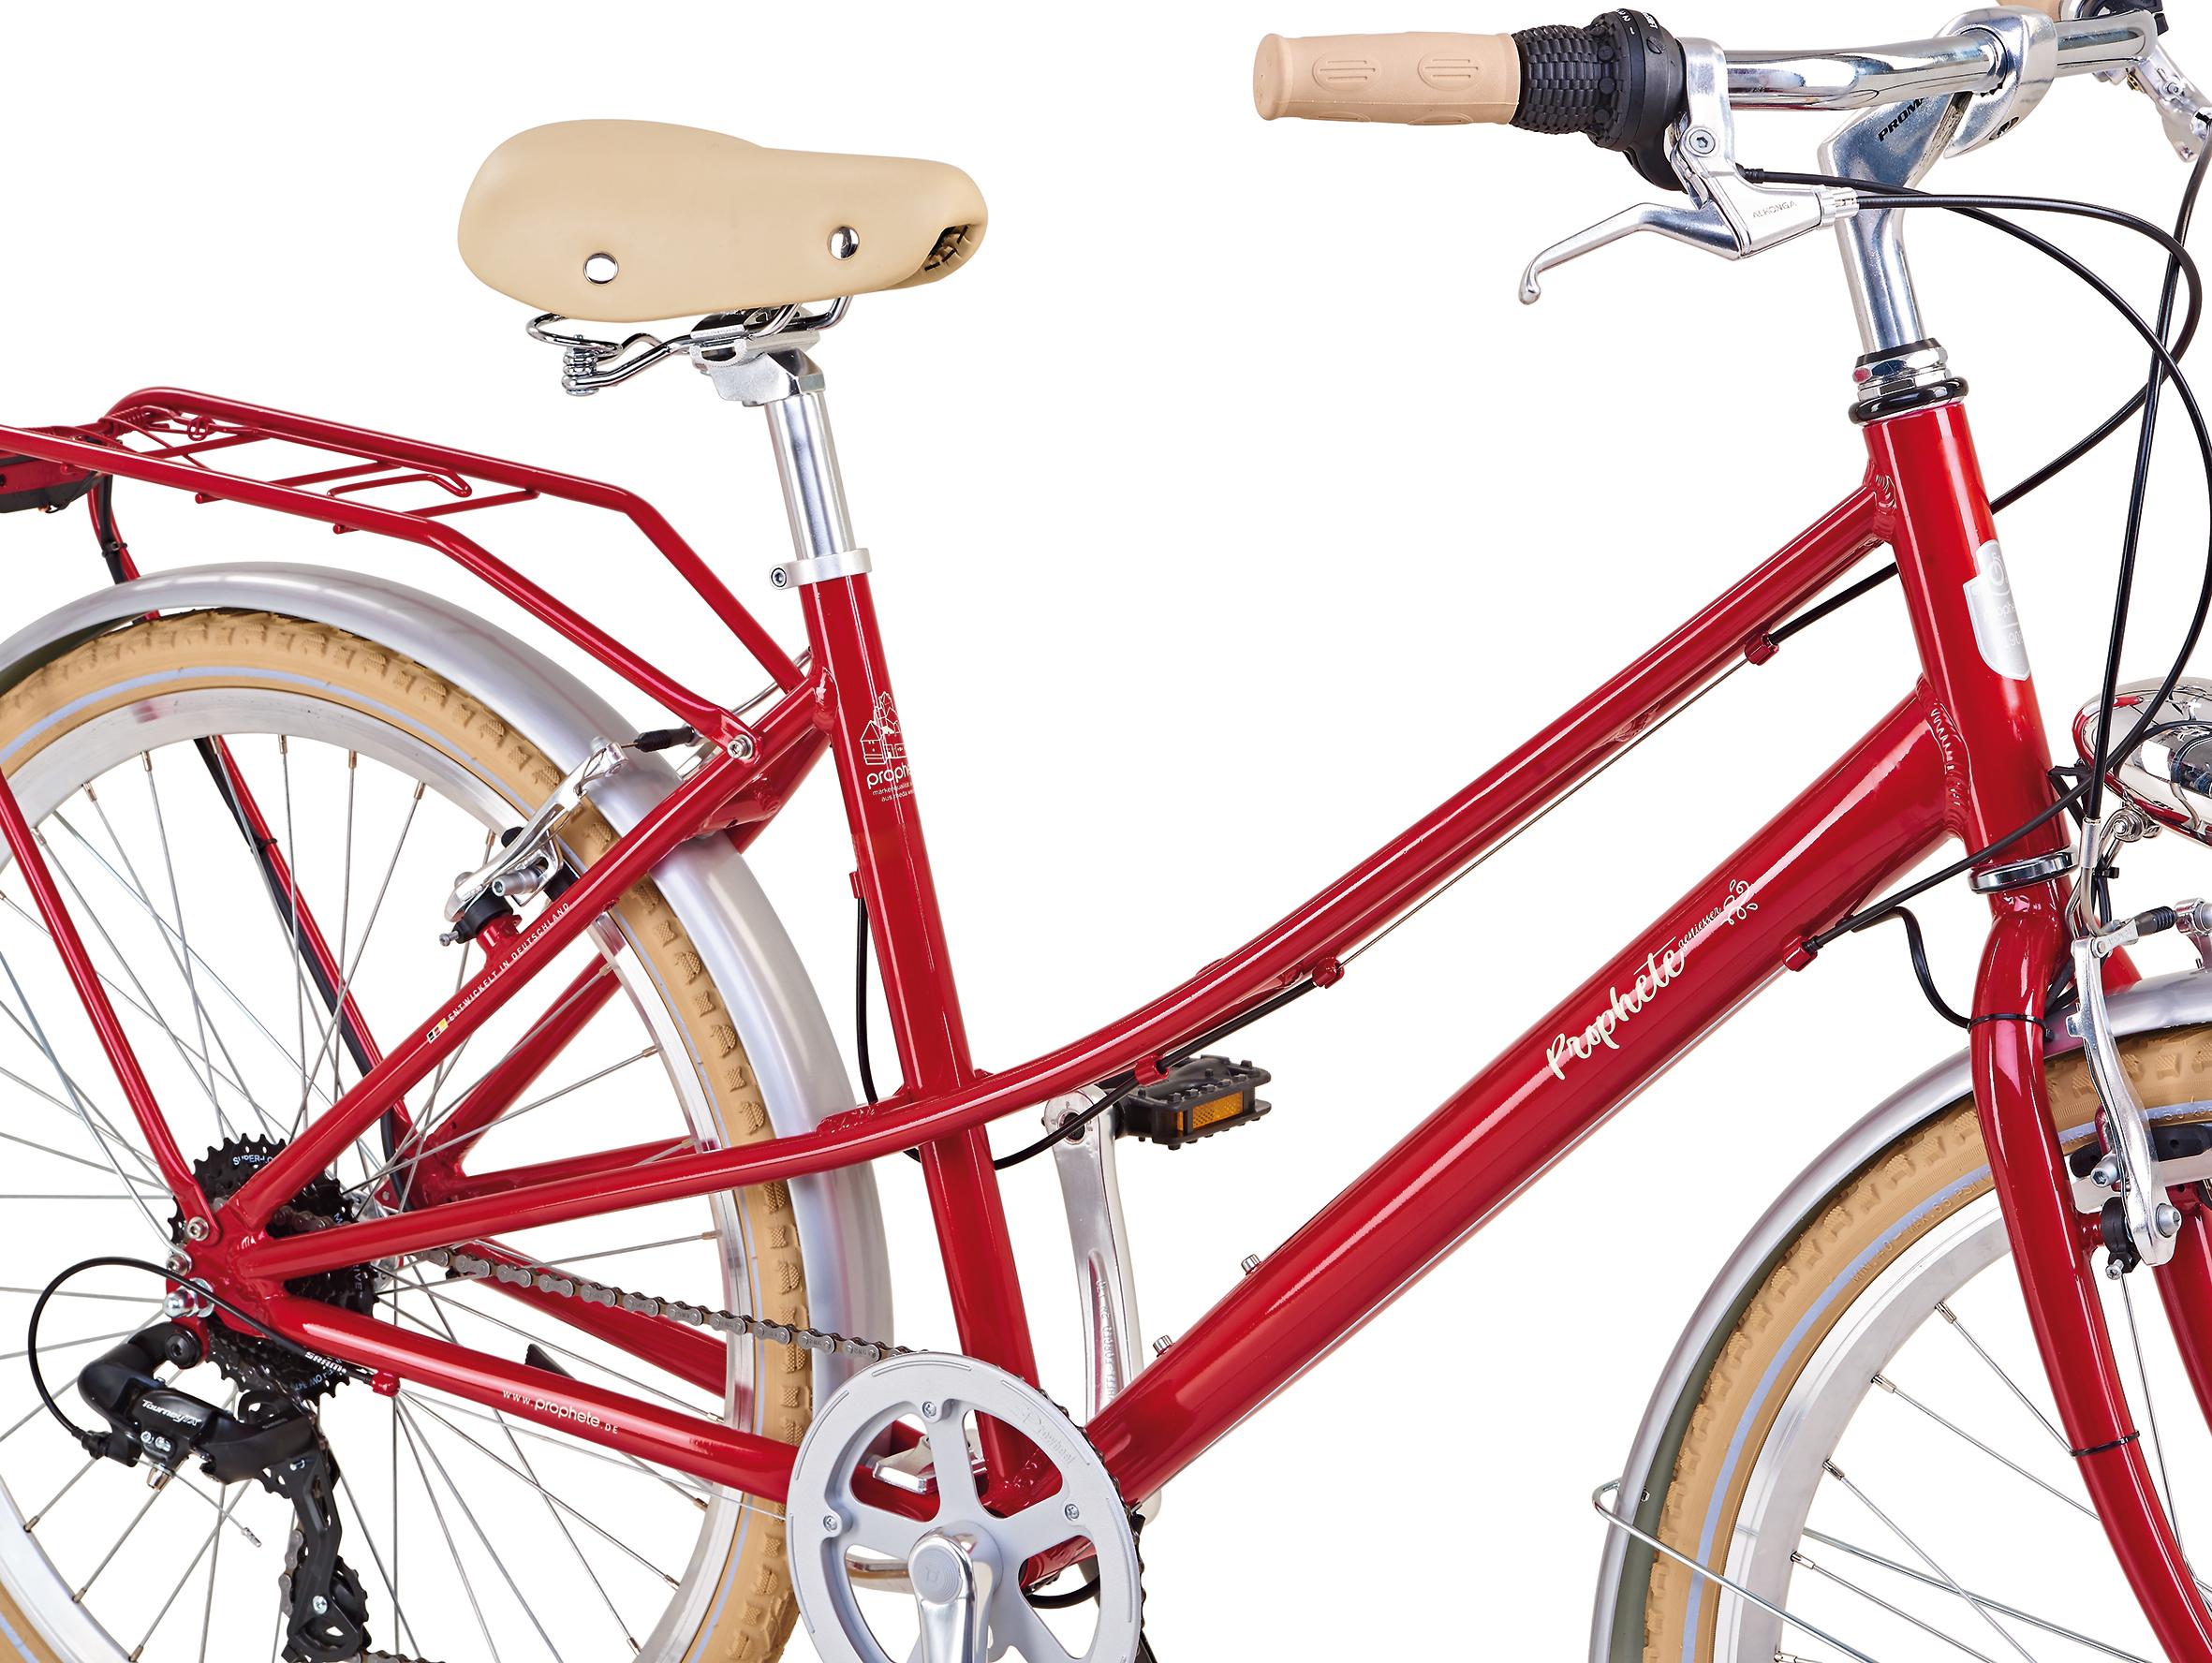 "Prophete Fahrrad / Cityrad Geniesser Retro City Bike 26"" Damen Bild 3"